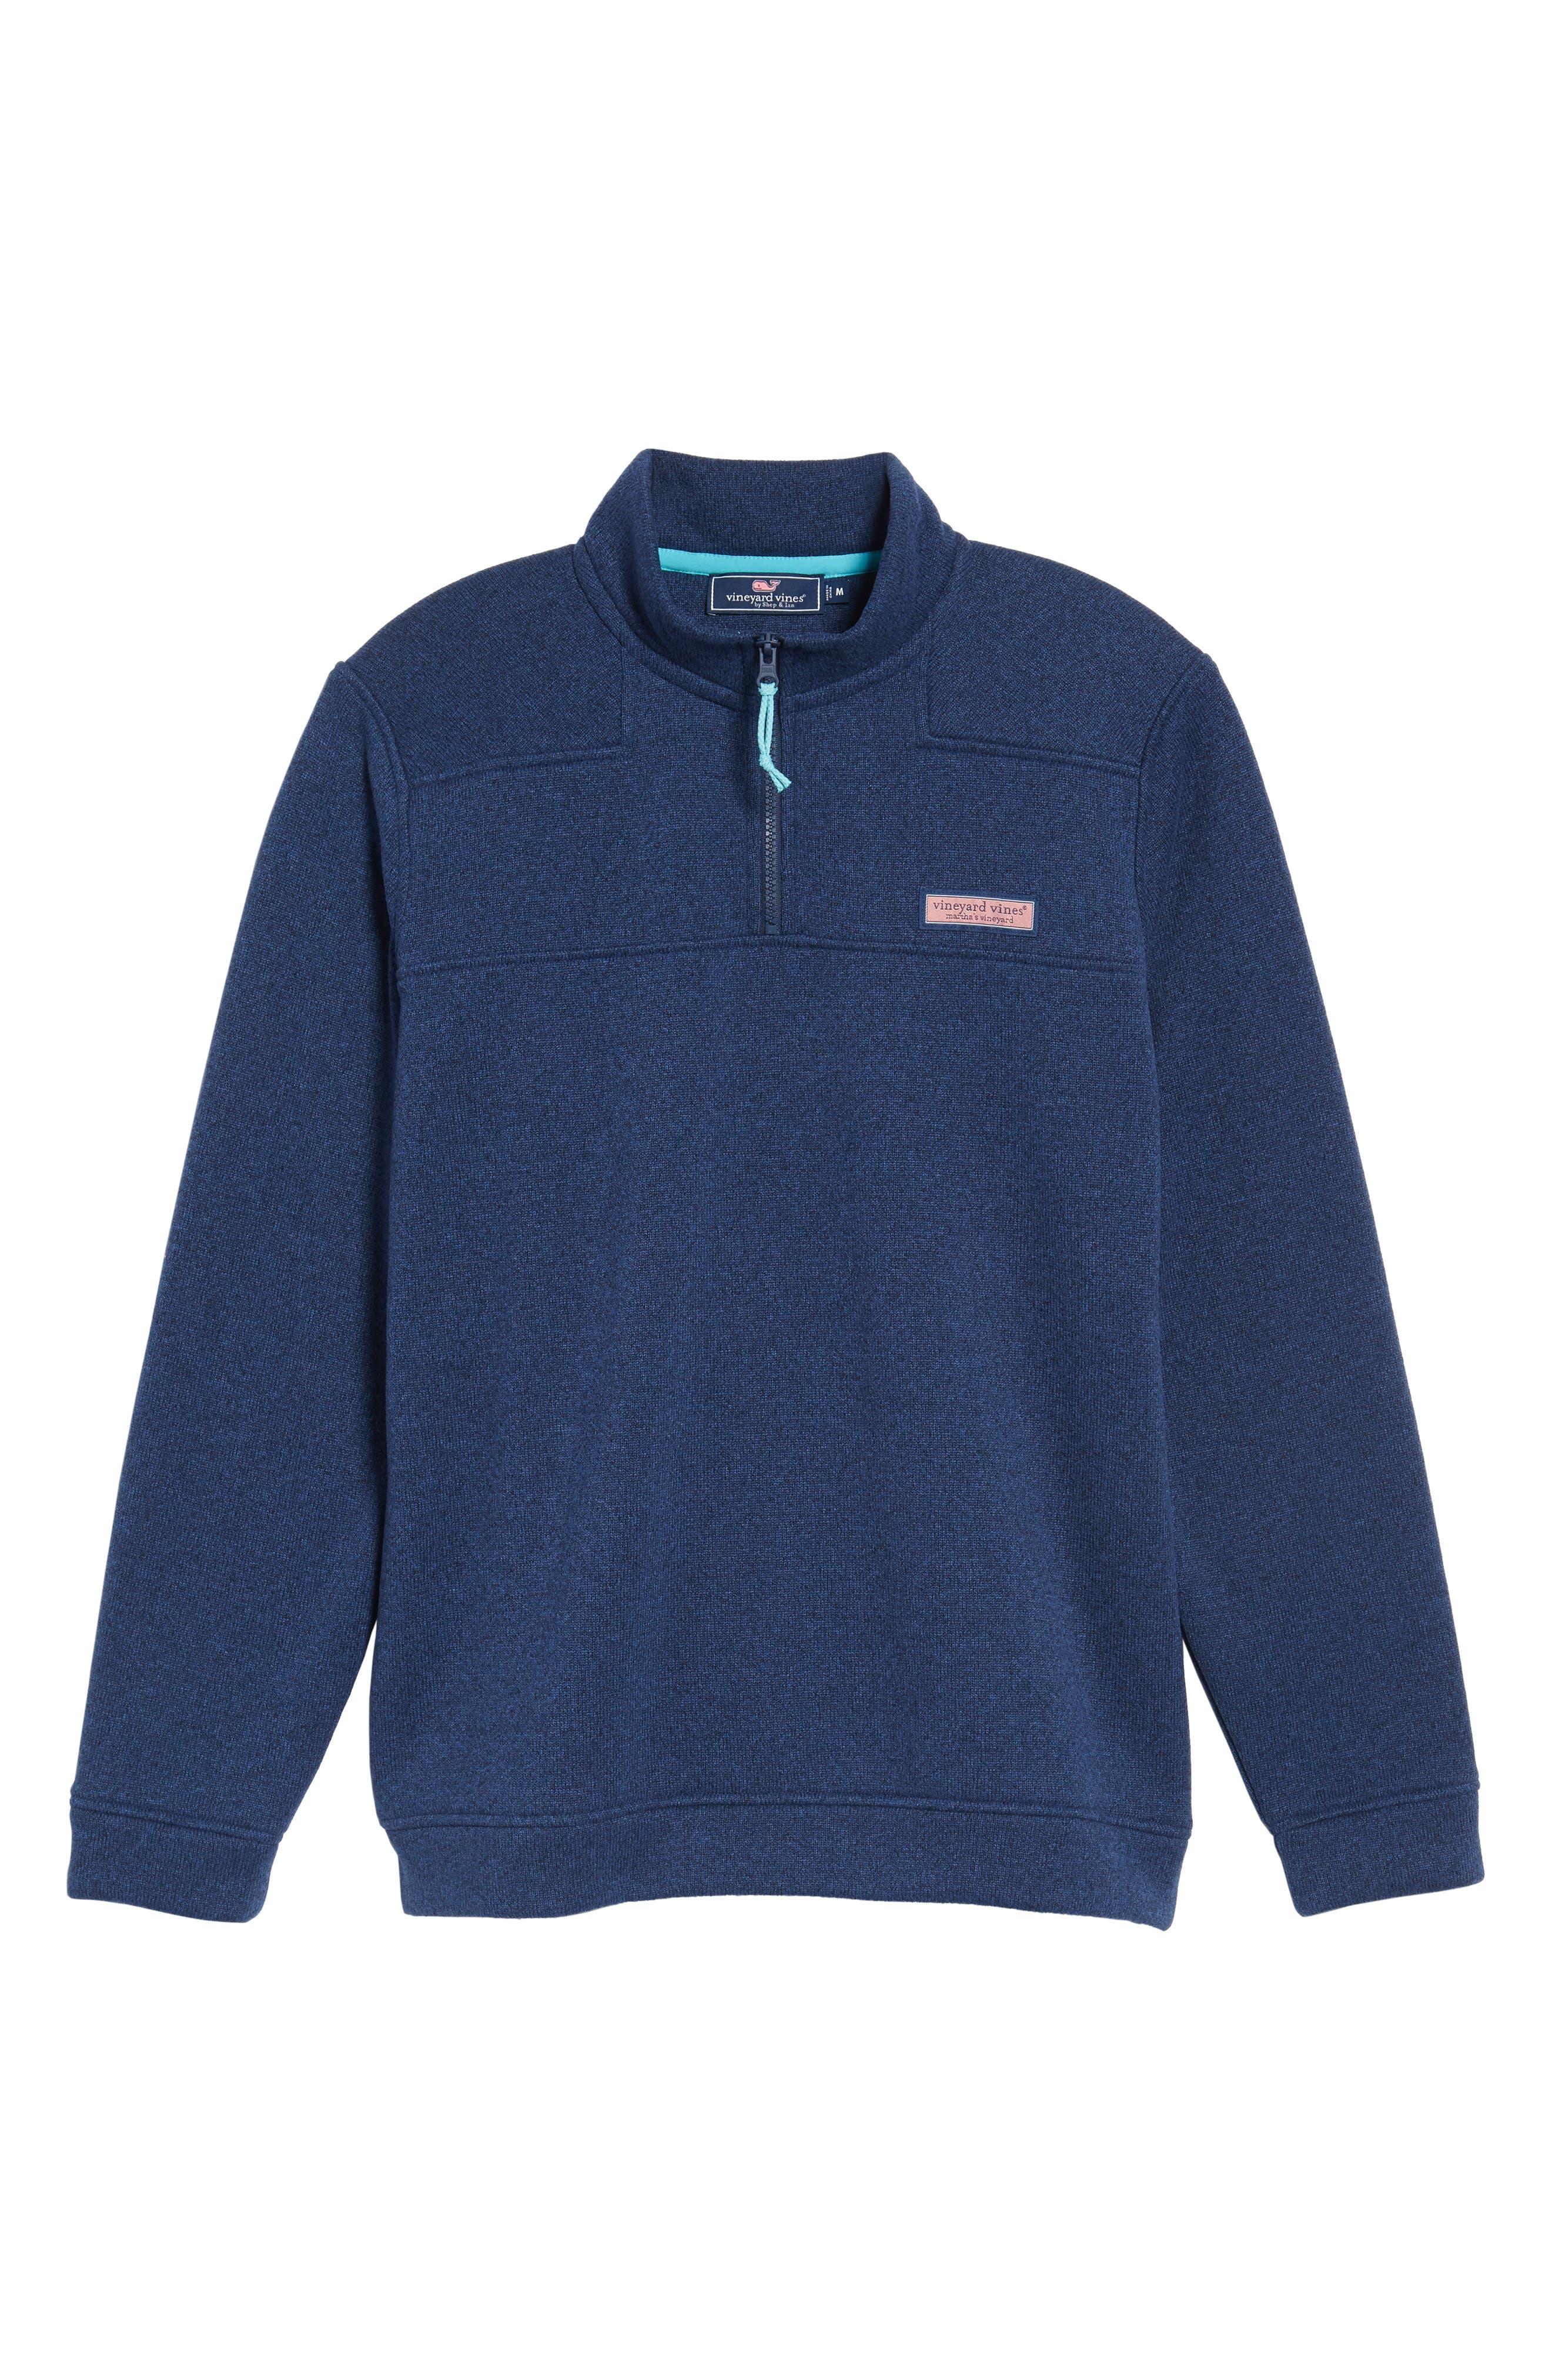 Shep Sweater Fleece Quarter Zip Pullover,                             Alternate thumbnail 12, color,